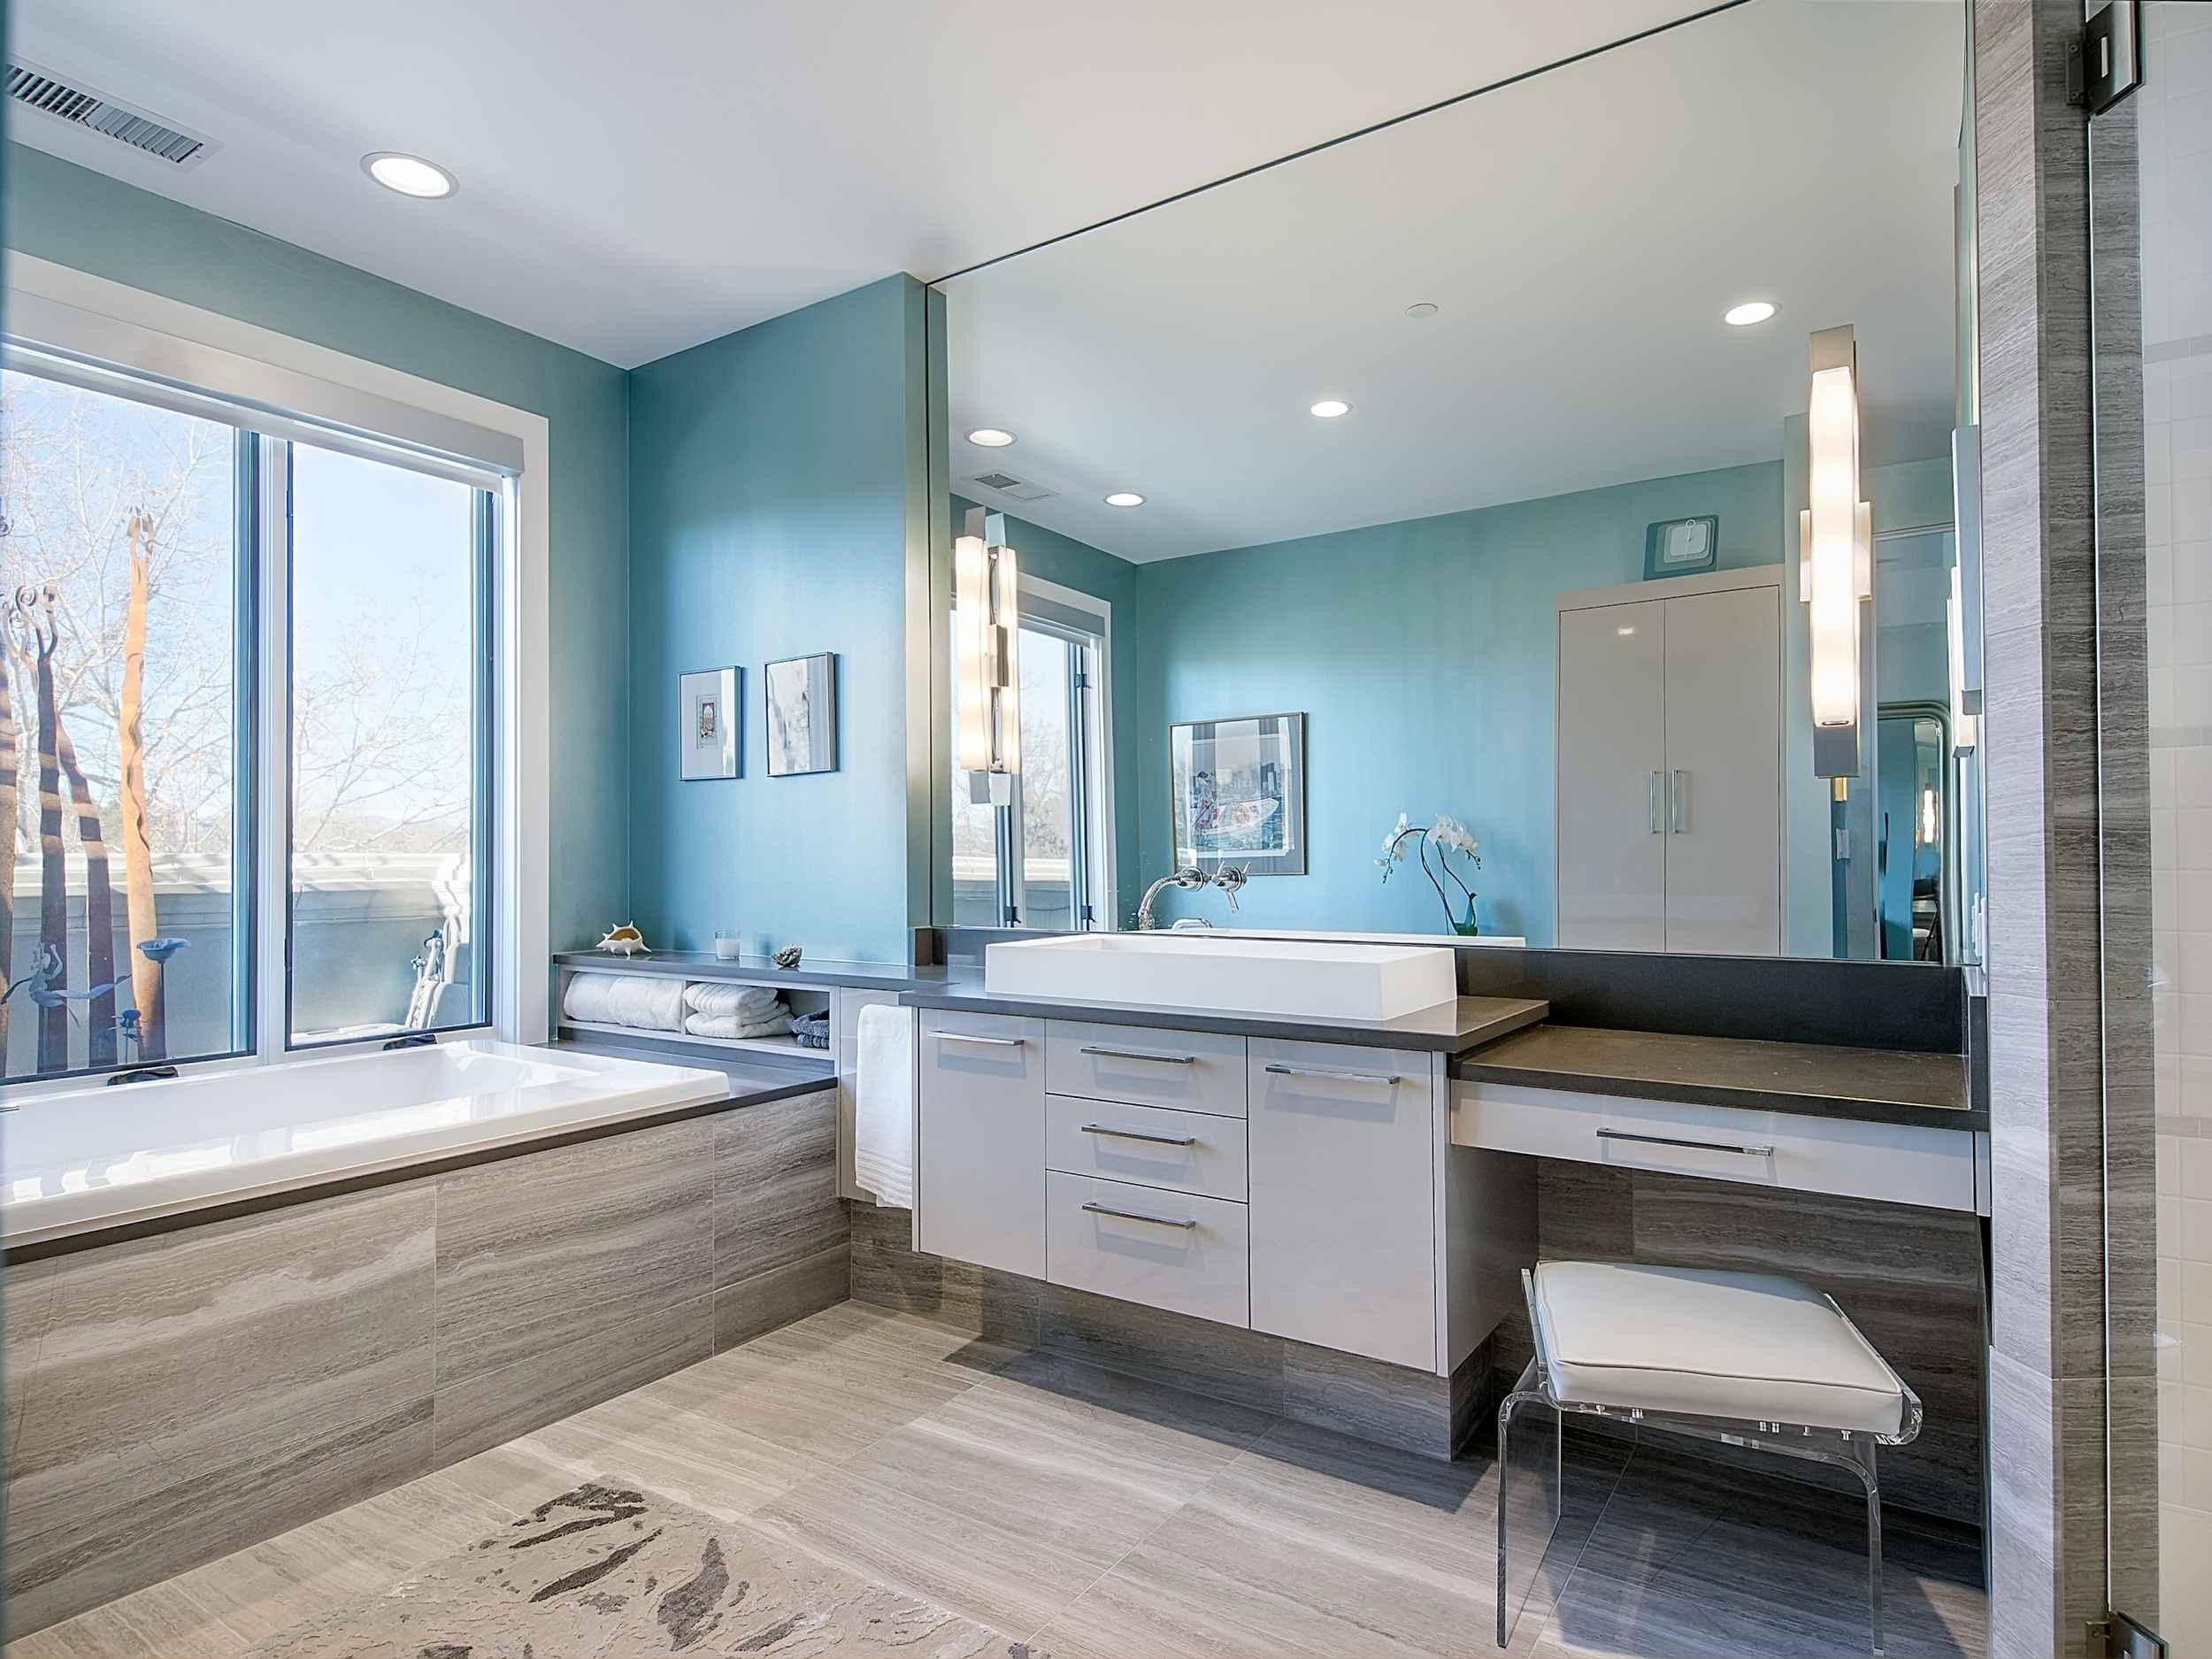 modern sanctuary — sanctuary kitchen and bath design-3.jpg